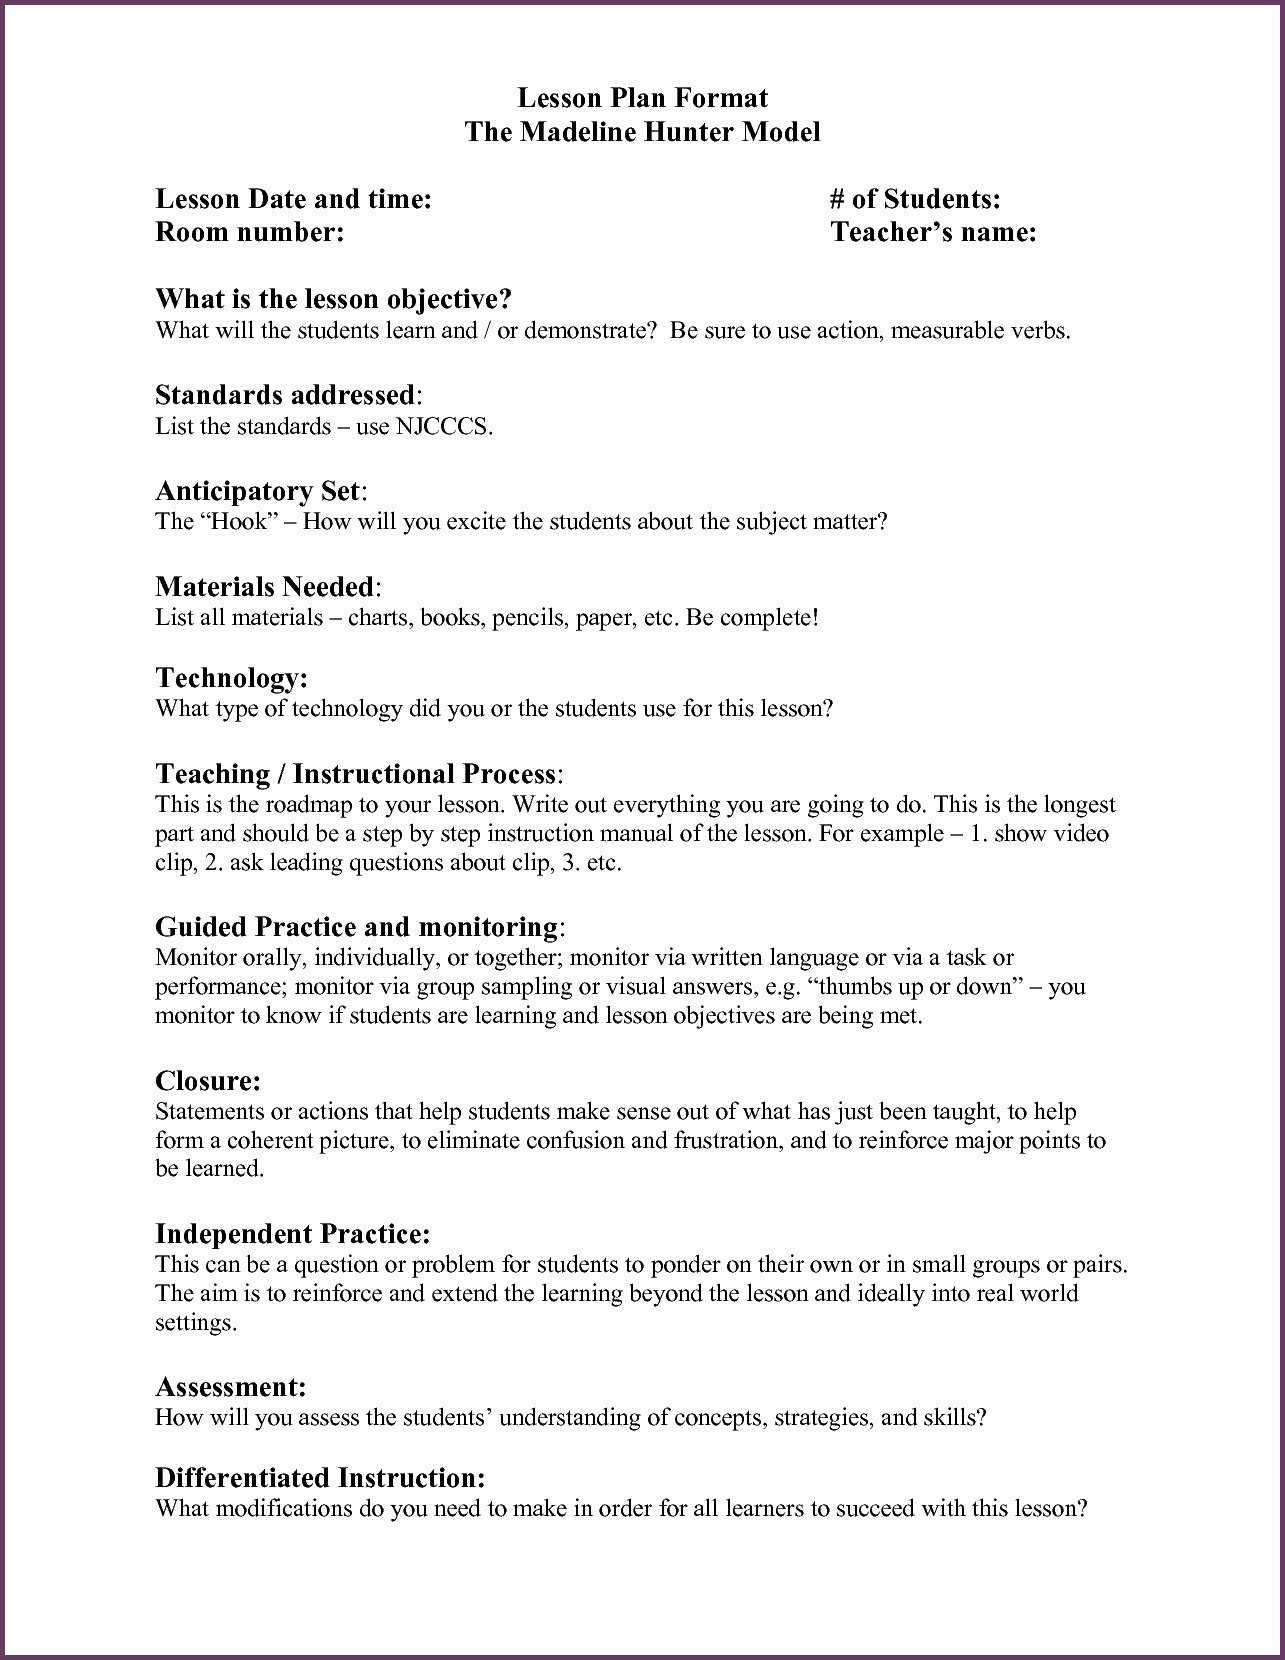 Madeline Hunter Lesson Plan Template Letter Sample Example inside Madeline Hunter Lesson Plan Blank Template